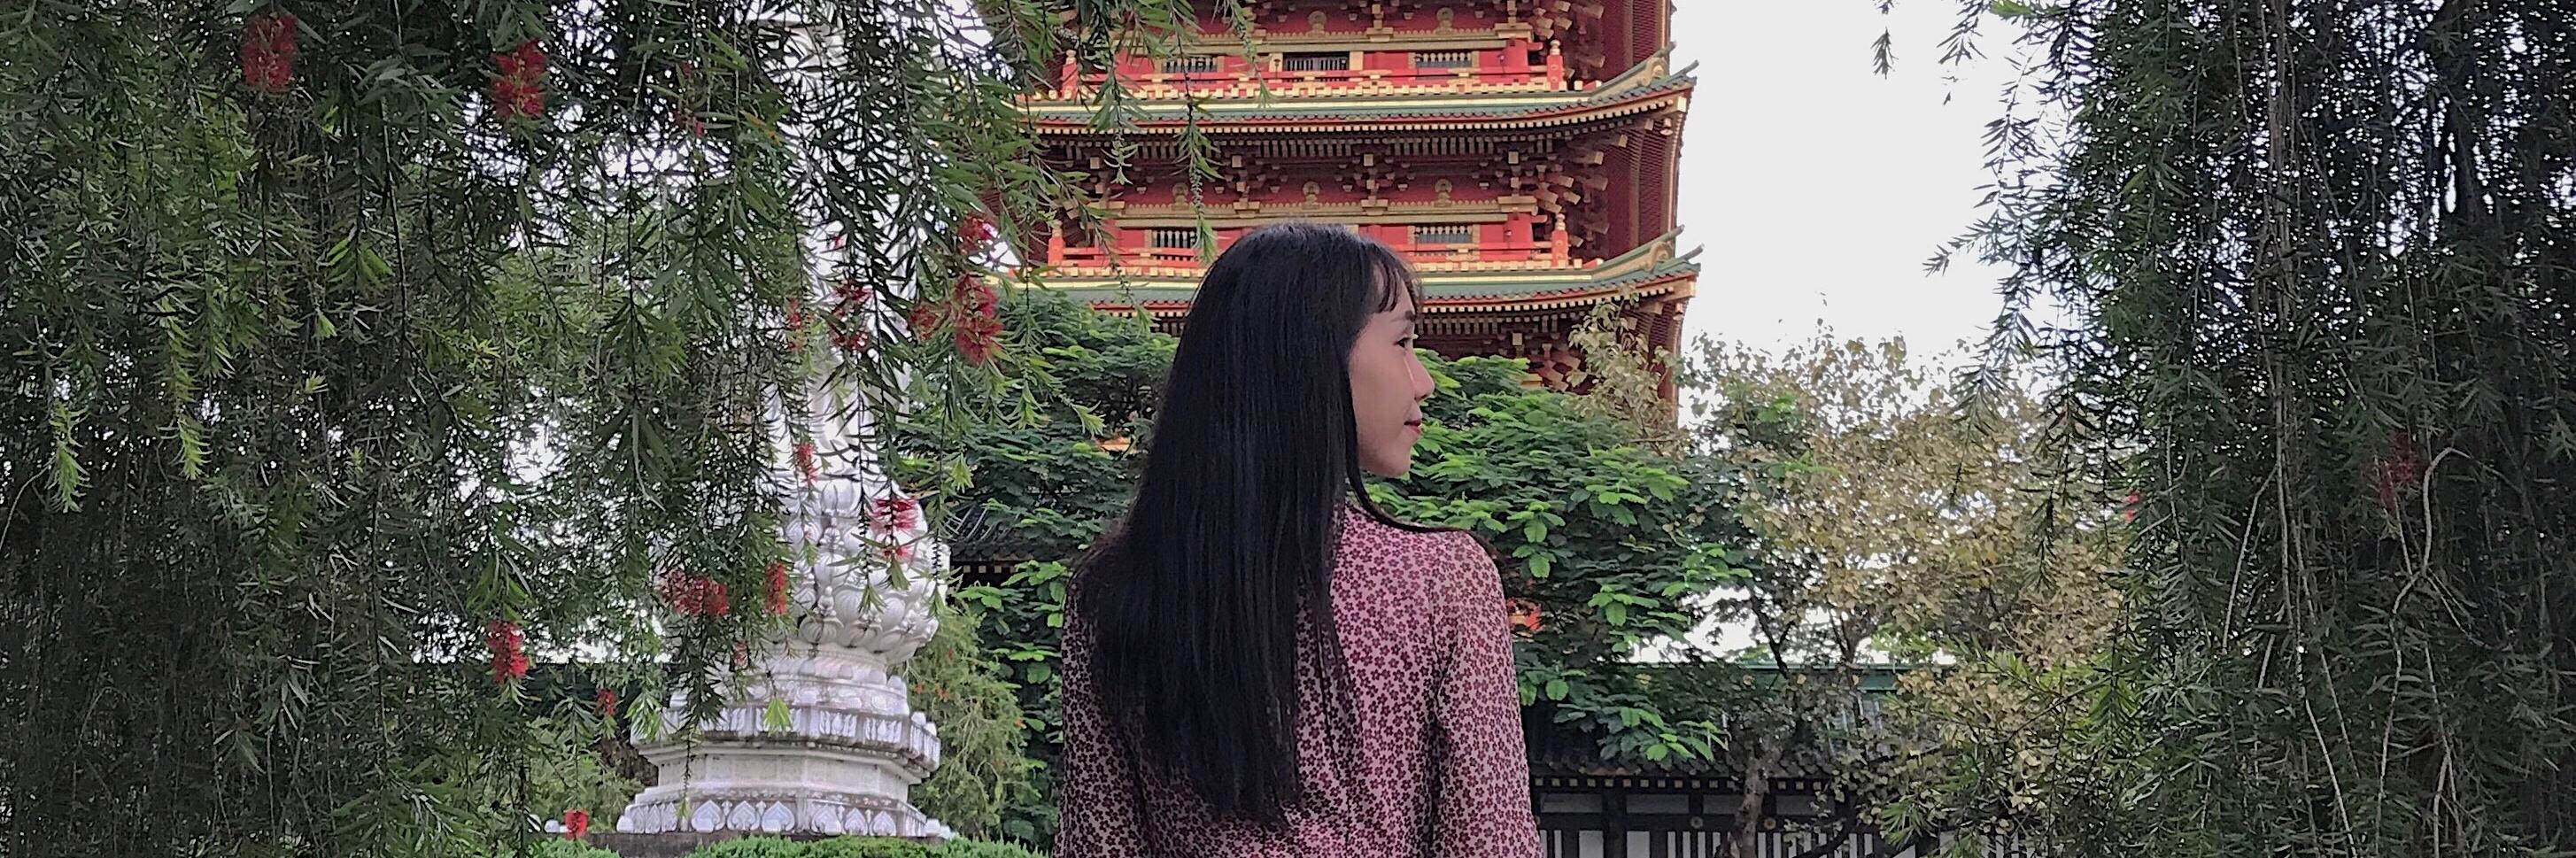 https://gody.vn/blog/yumi.uyenthuong06063858/post/pho-nui-gia-lai-bien-ho-pleiku-4728